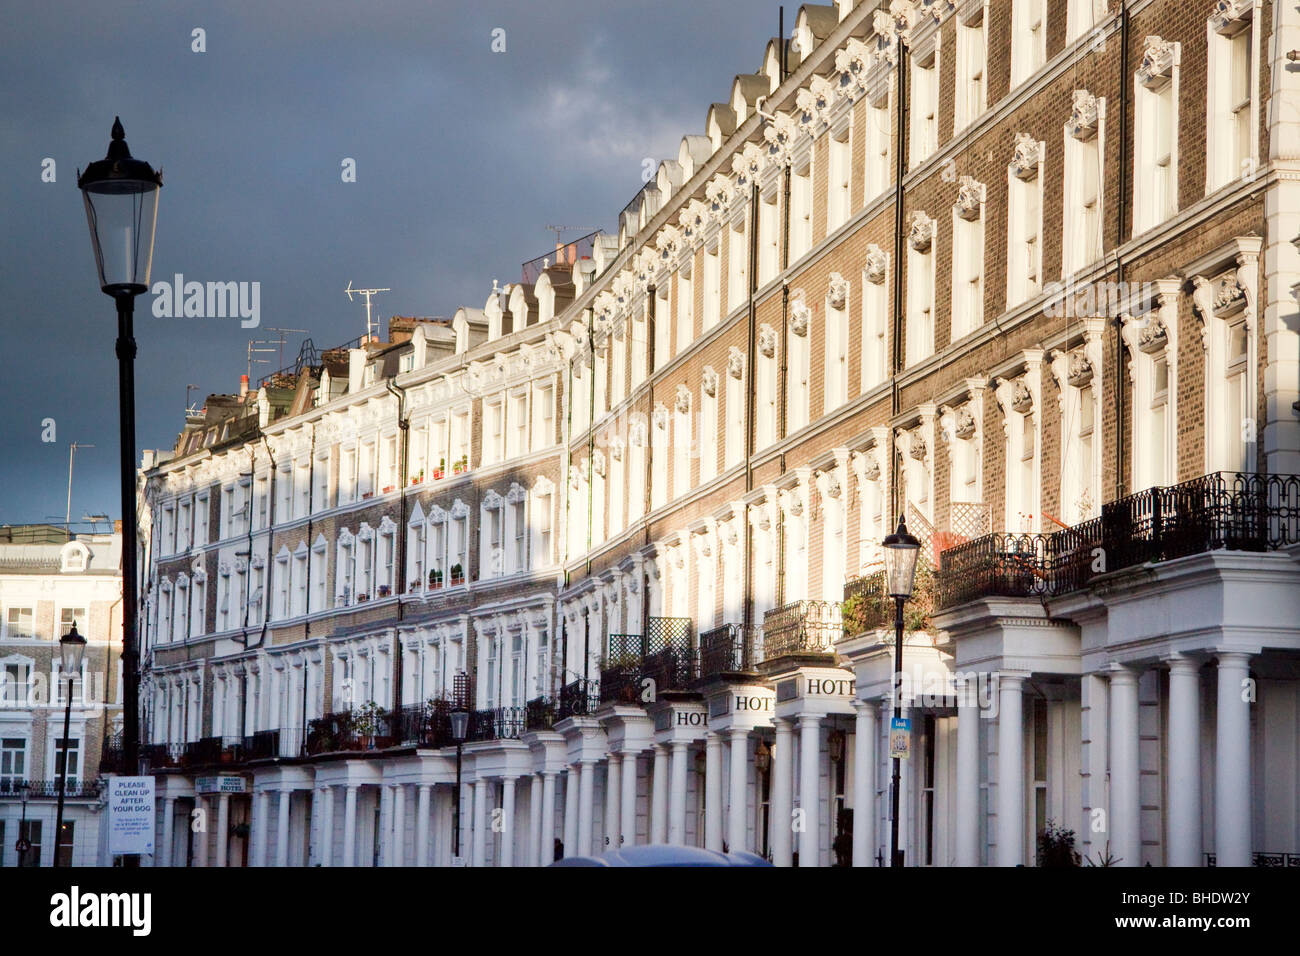 Hotels Earls Court Area London